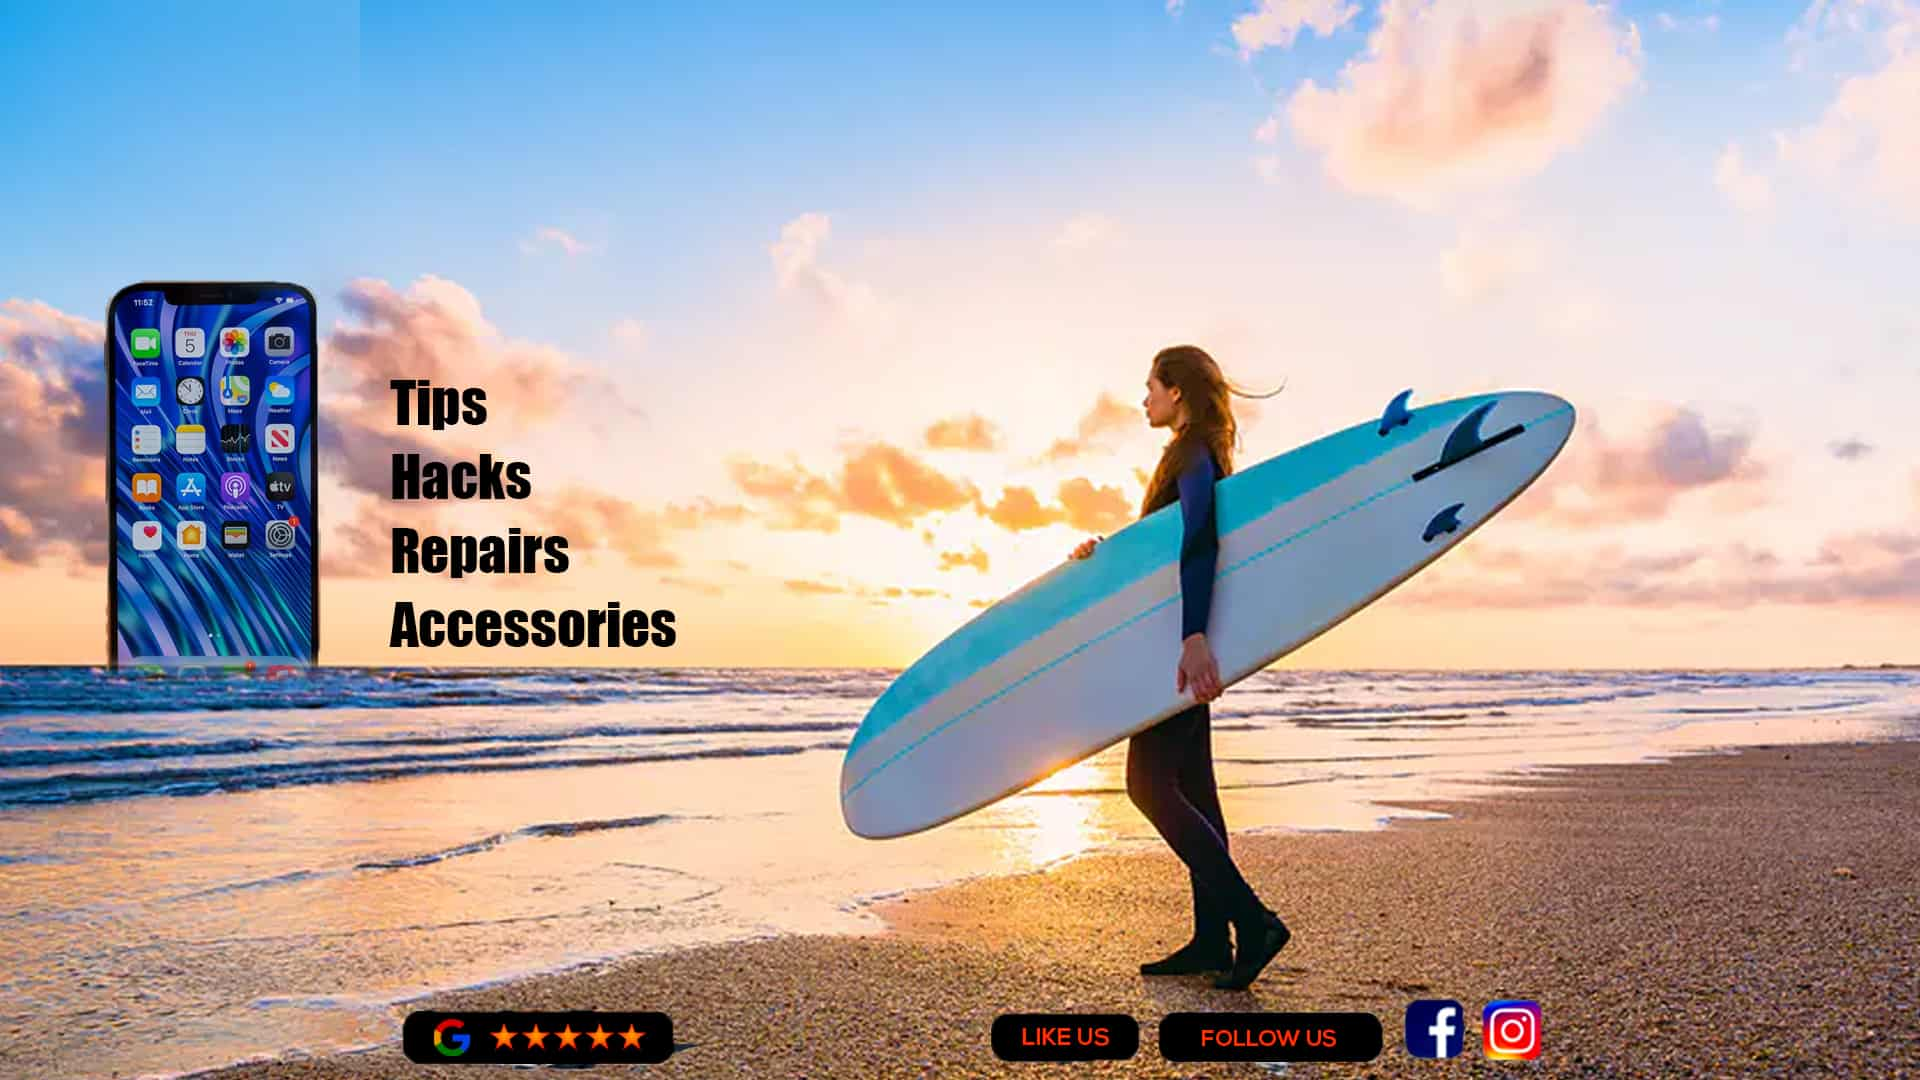 Tips Hacks to Repair Accessories   Mobile Accessories Bondi Beach